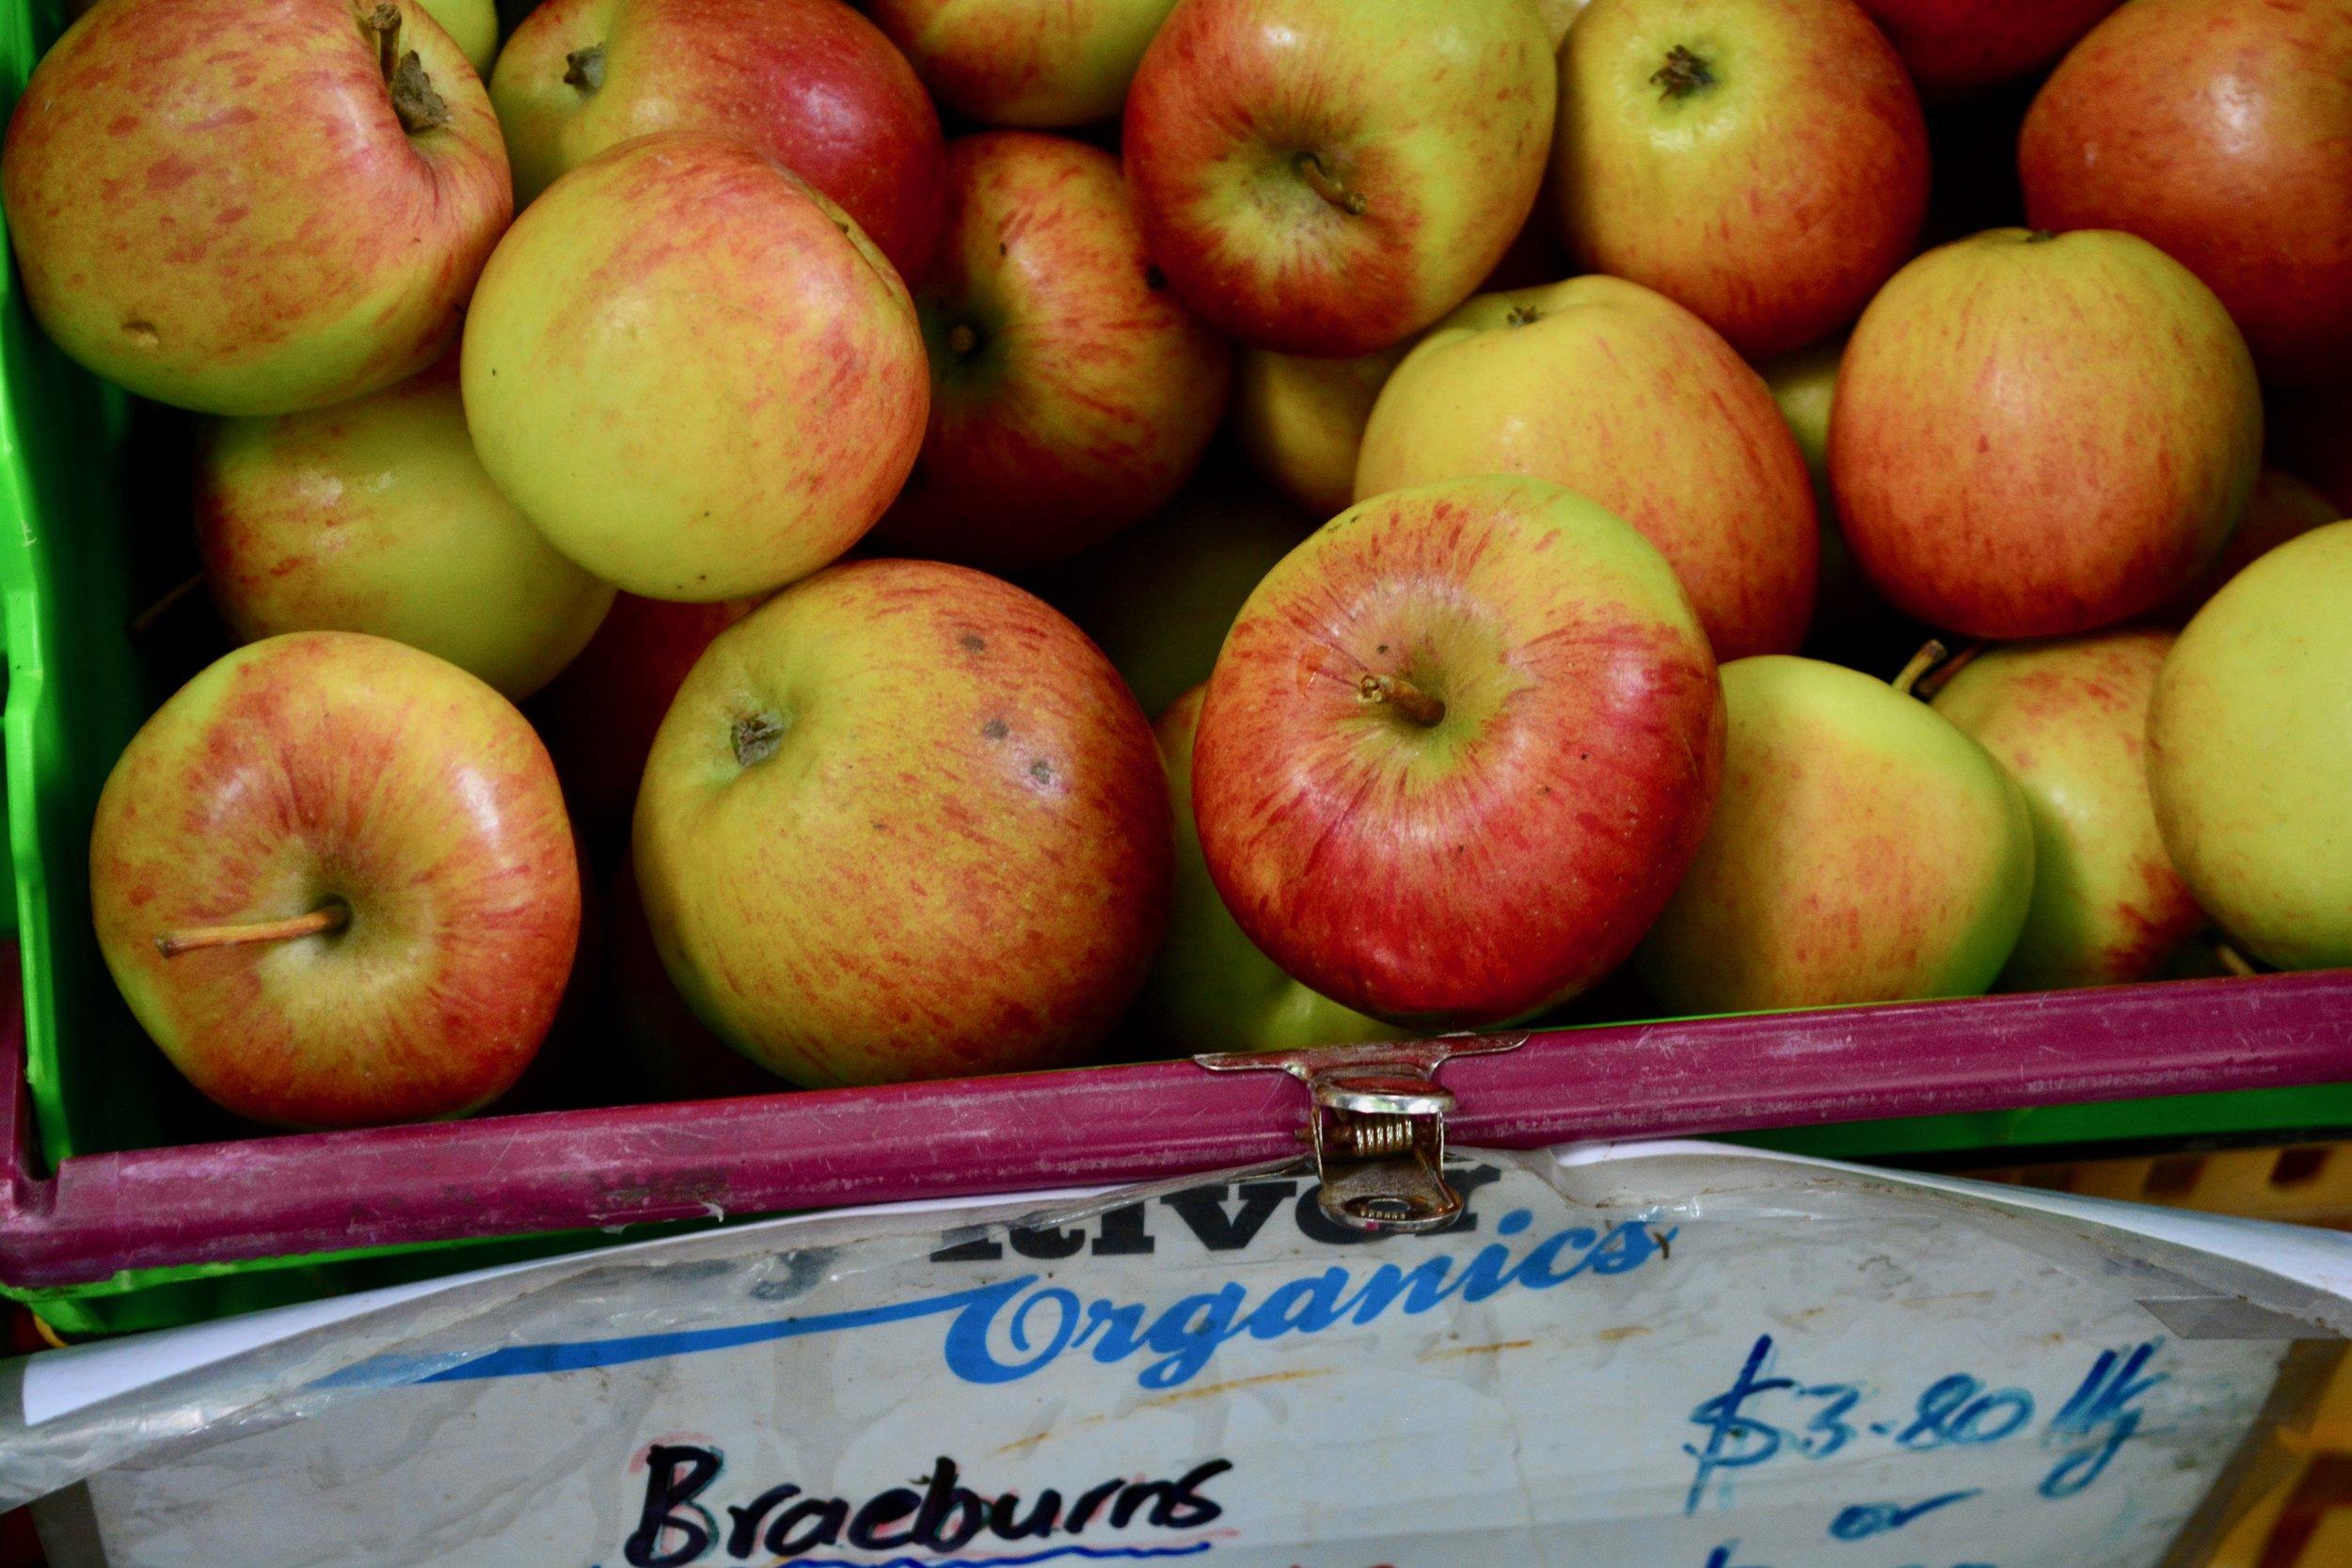 Apples at Christchurch Farmer's Market